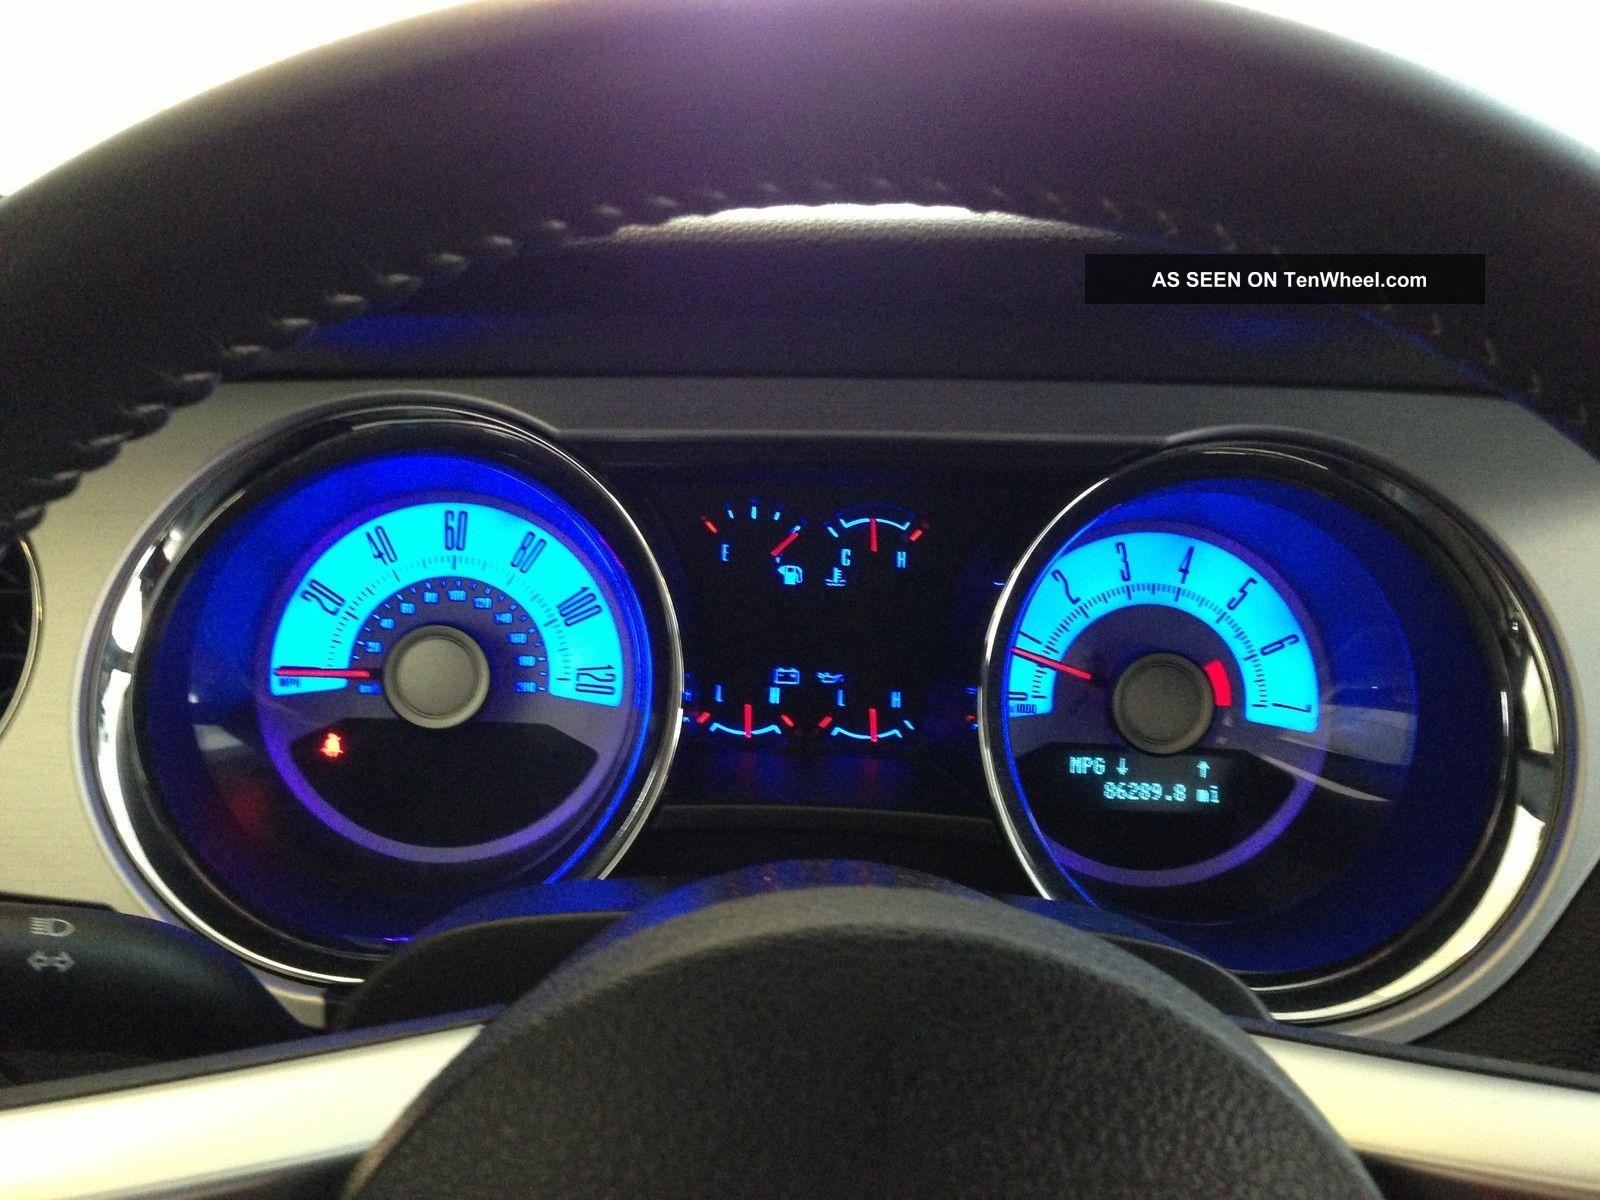 2010 Ford Mustang V6 Premium W Pony Package Grabber Blue